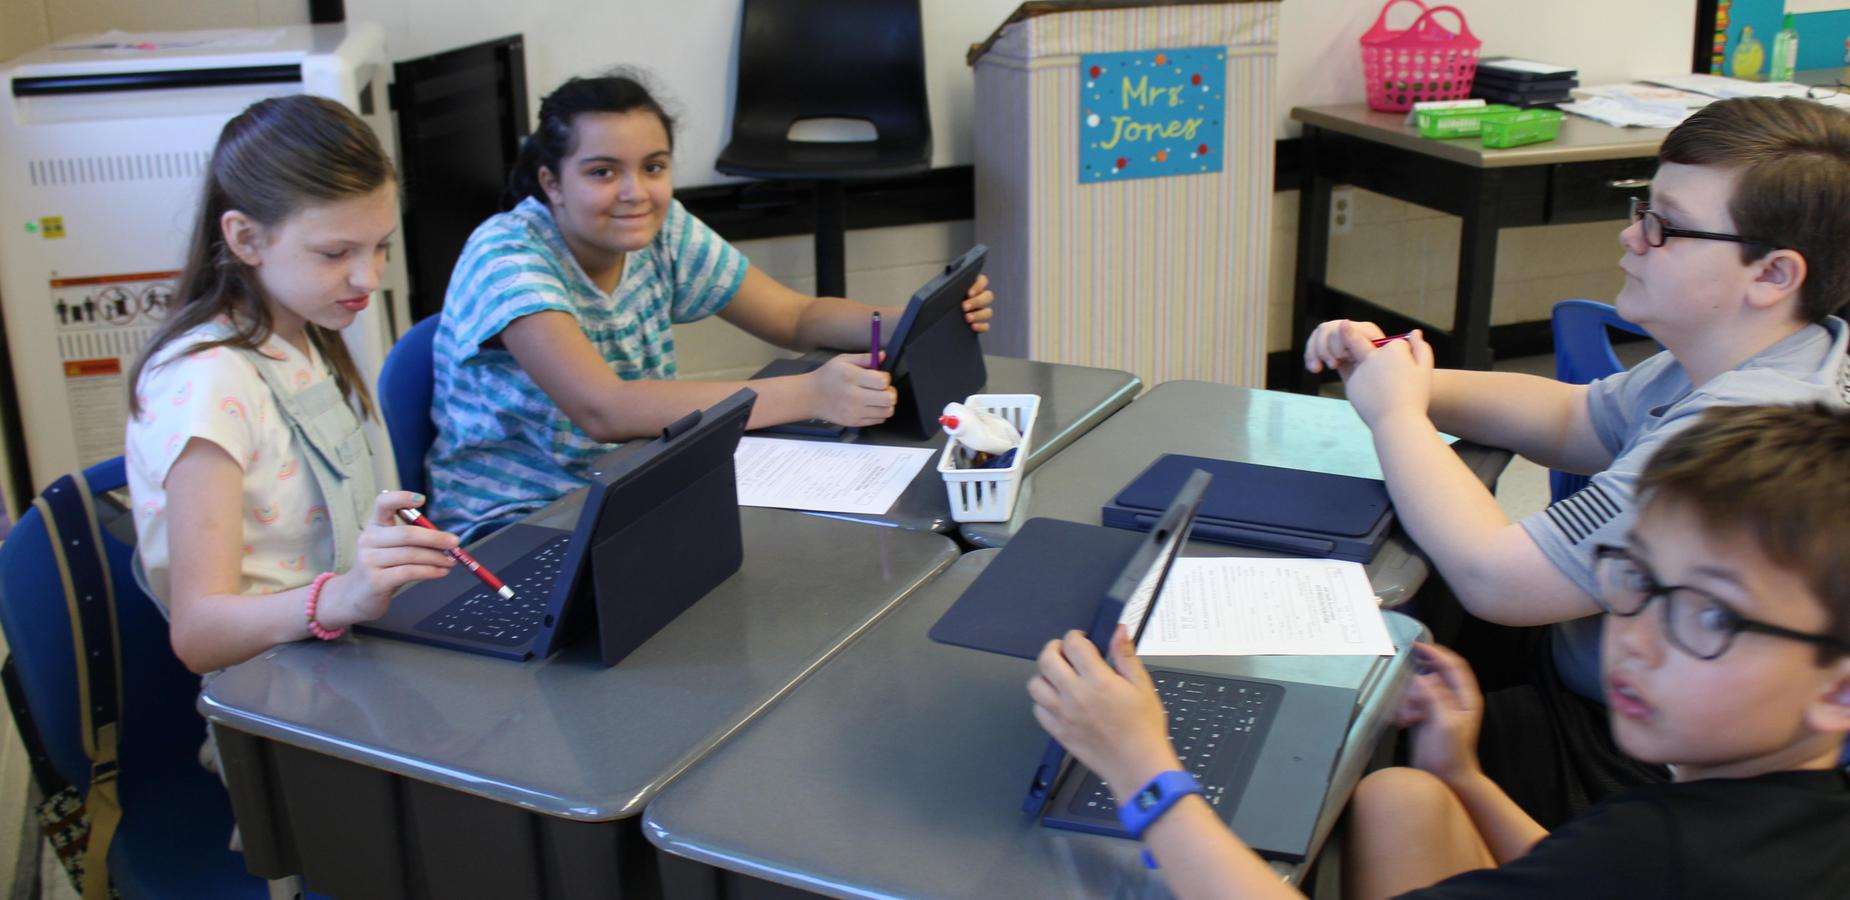 5th Graders Using iPads